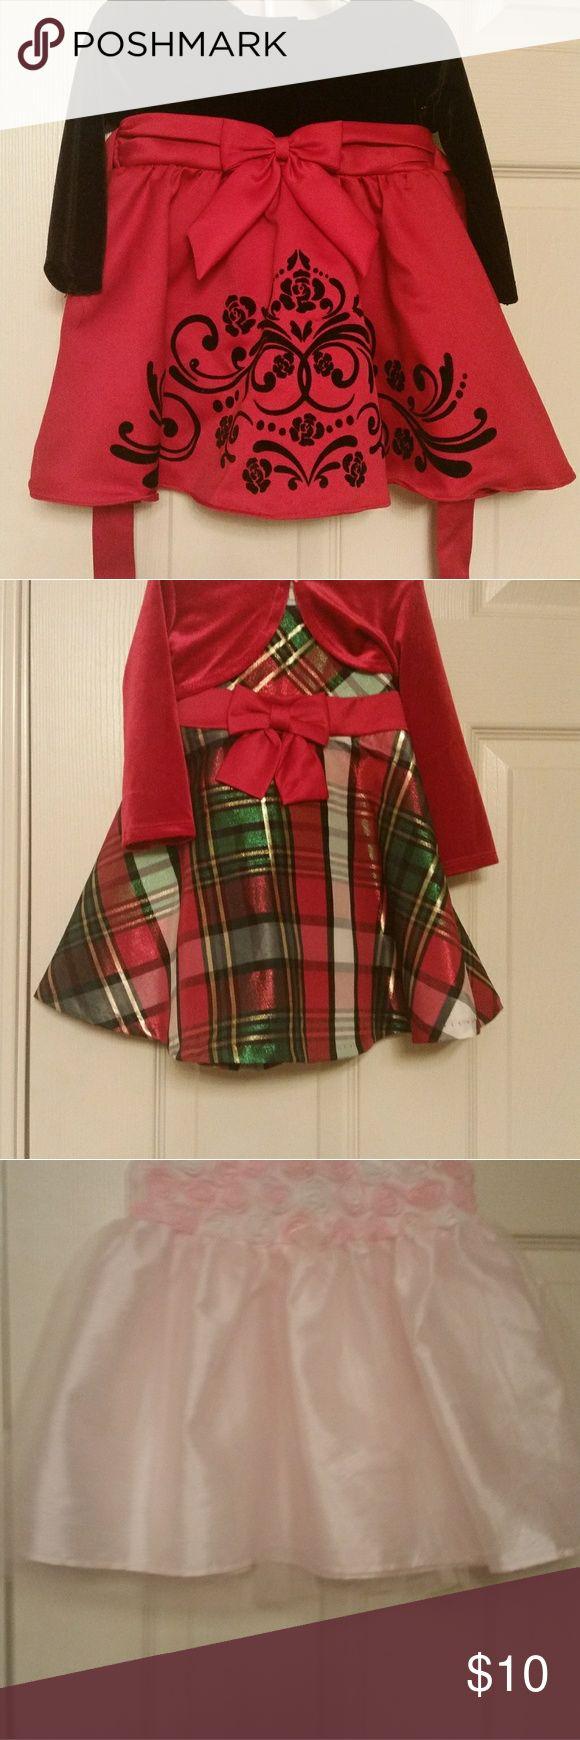 Girls dresses Church attire Dresses Formal